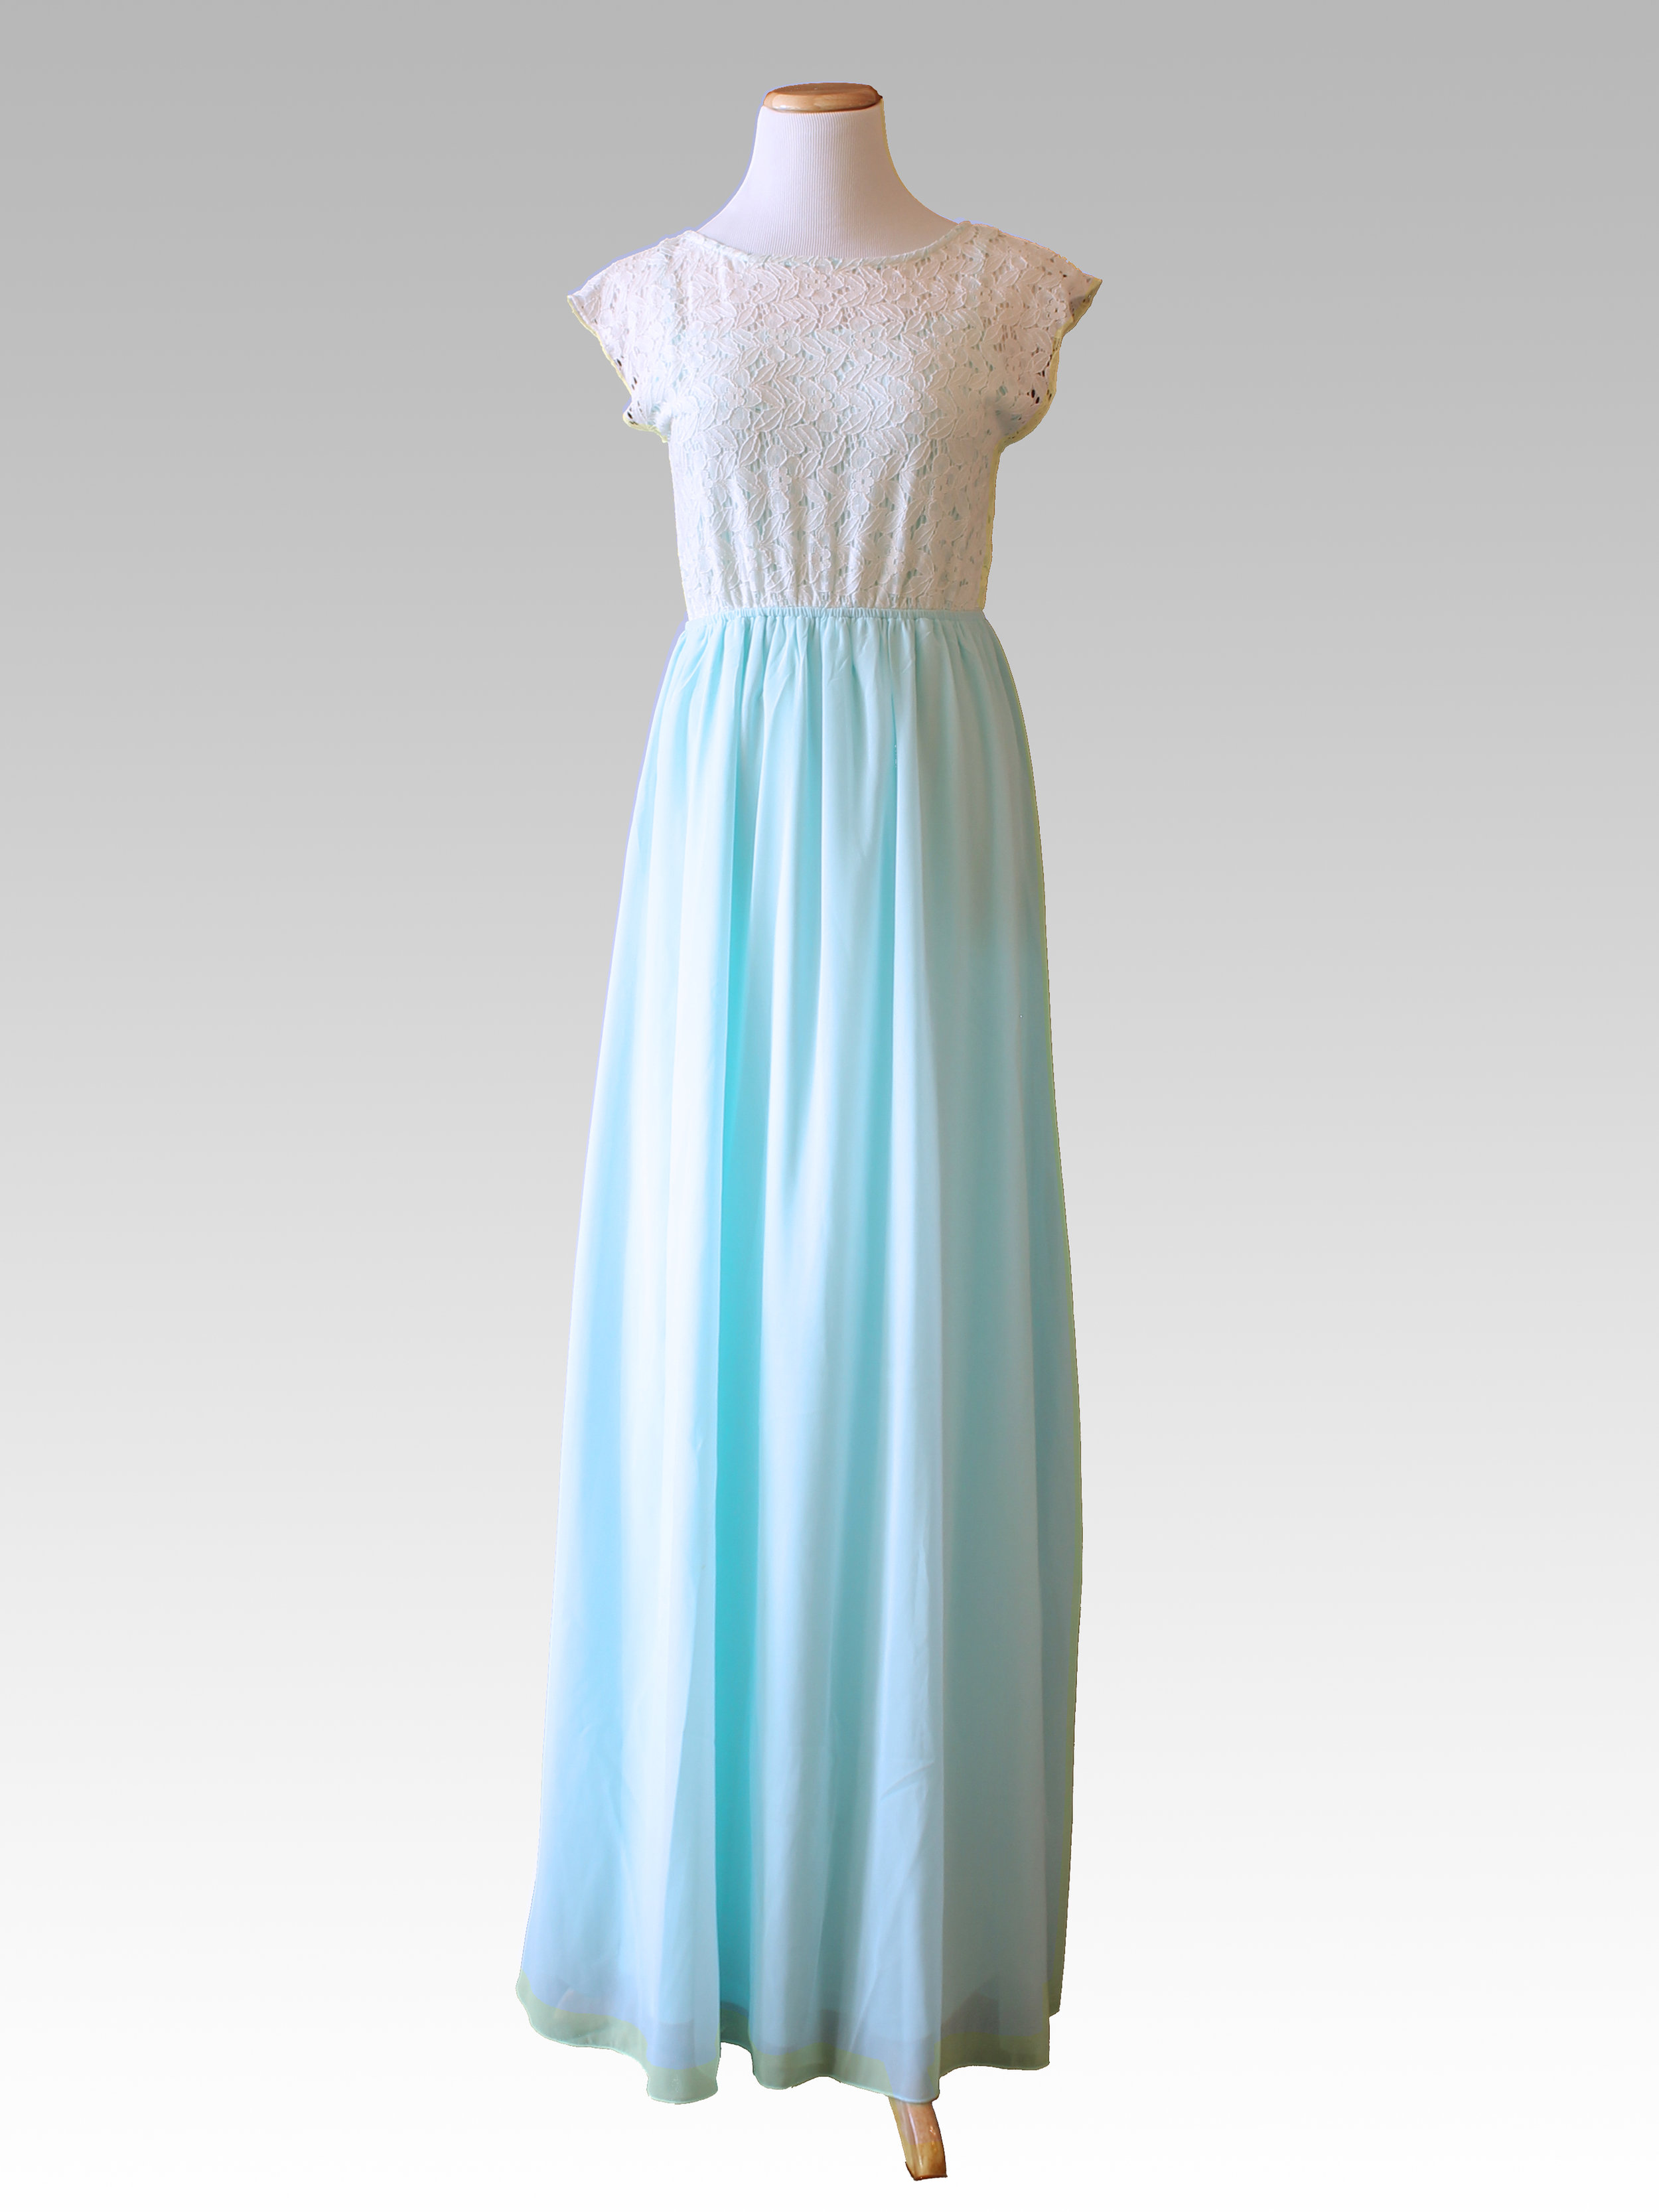 blue-white-maxi-dress-front.jpg